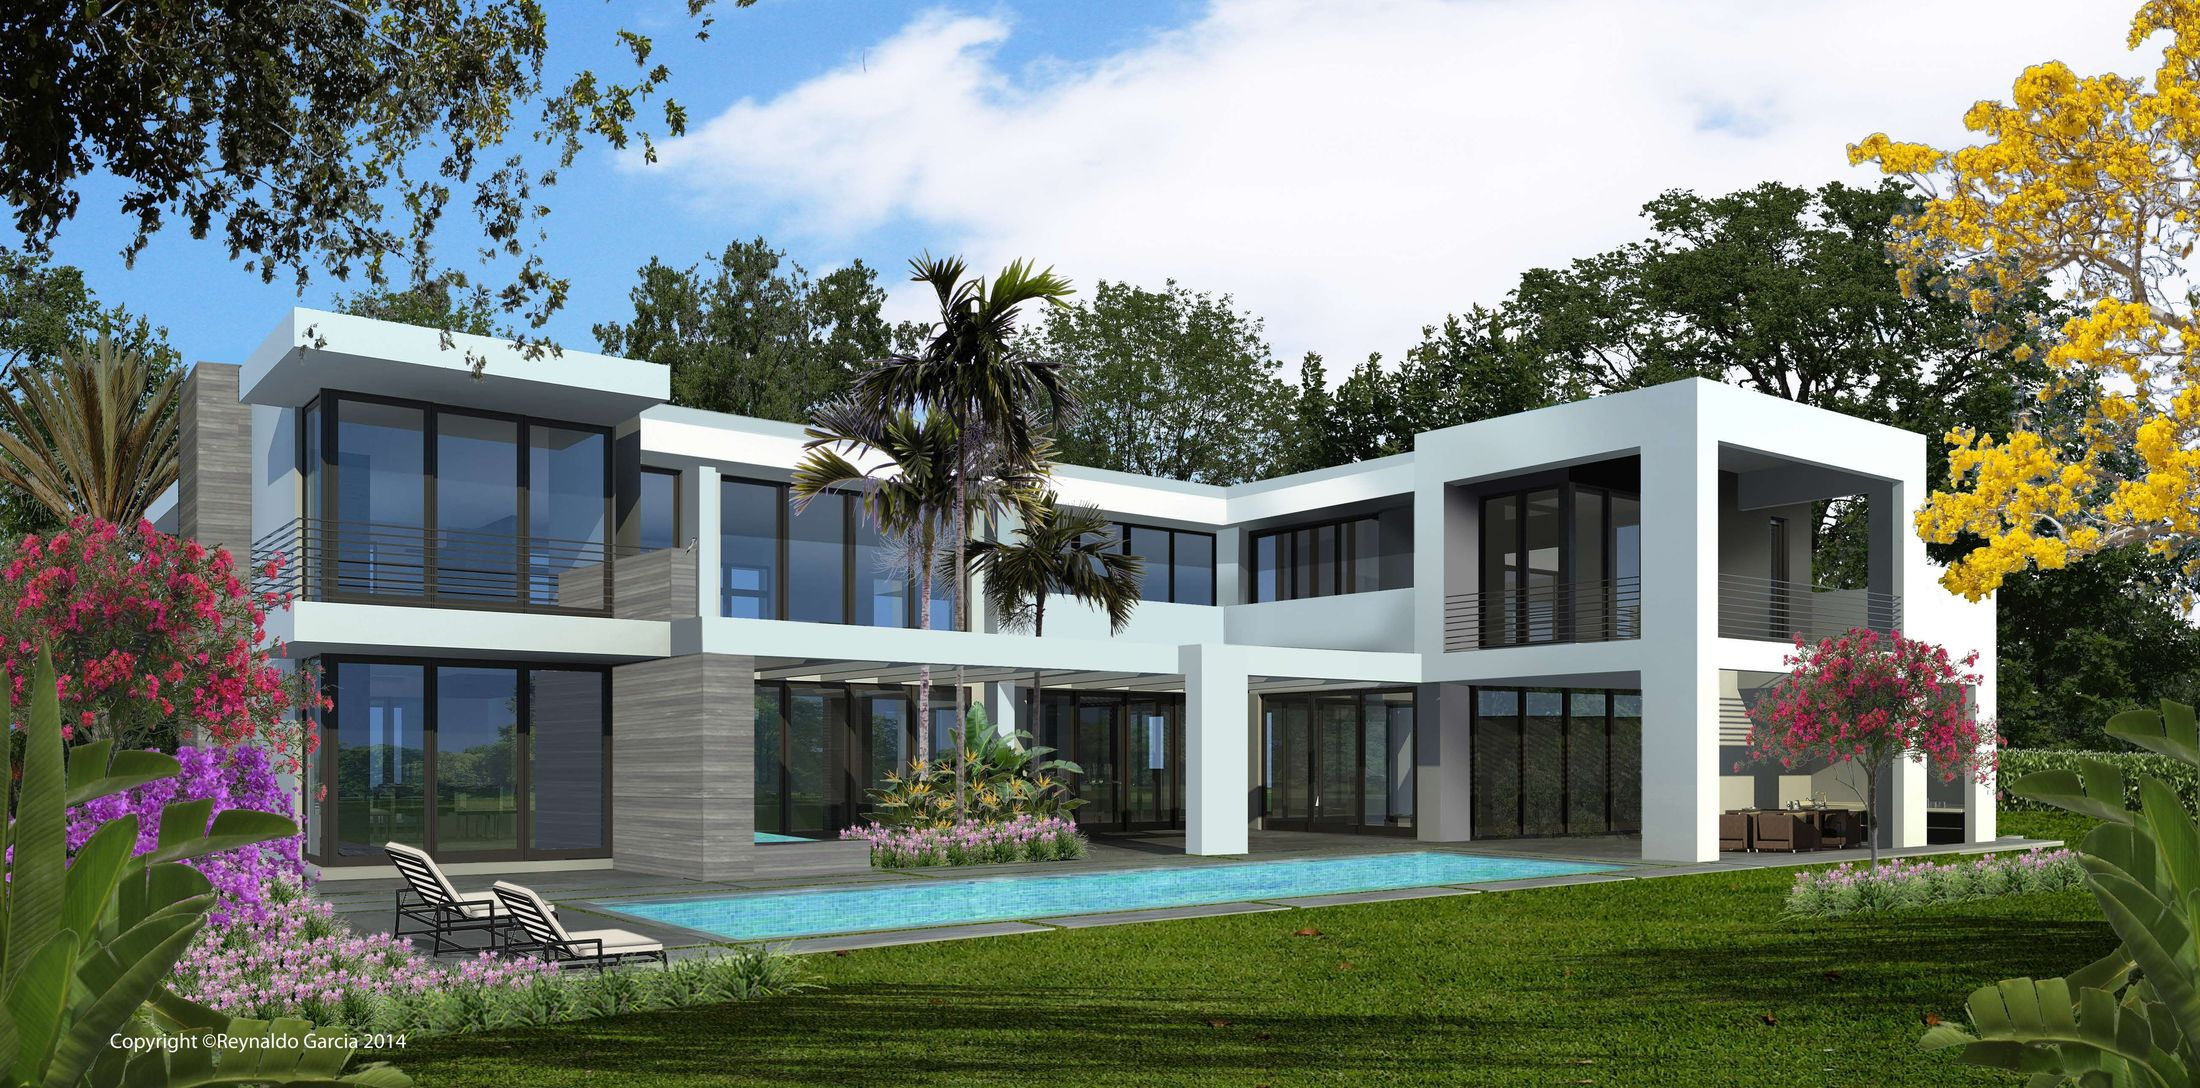 Palm Springs Real Estate Mls Listings Homes Condos